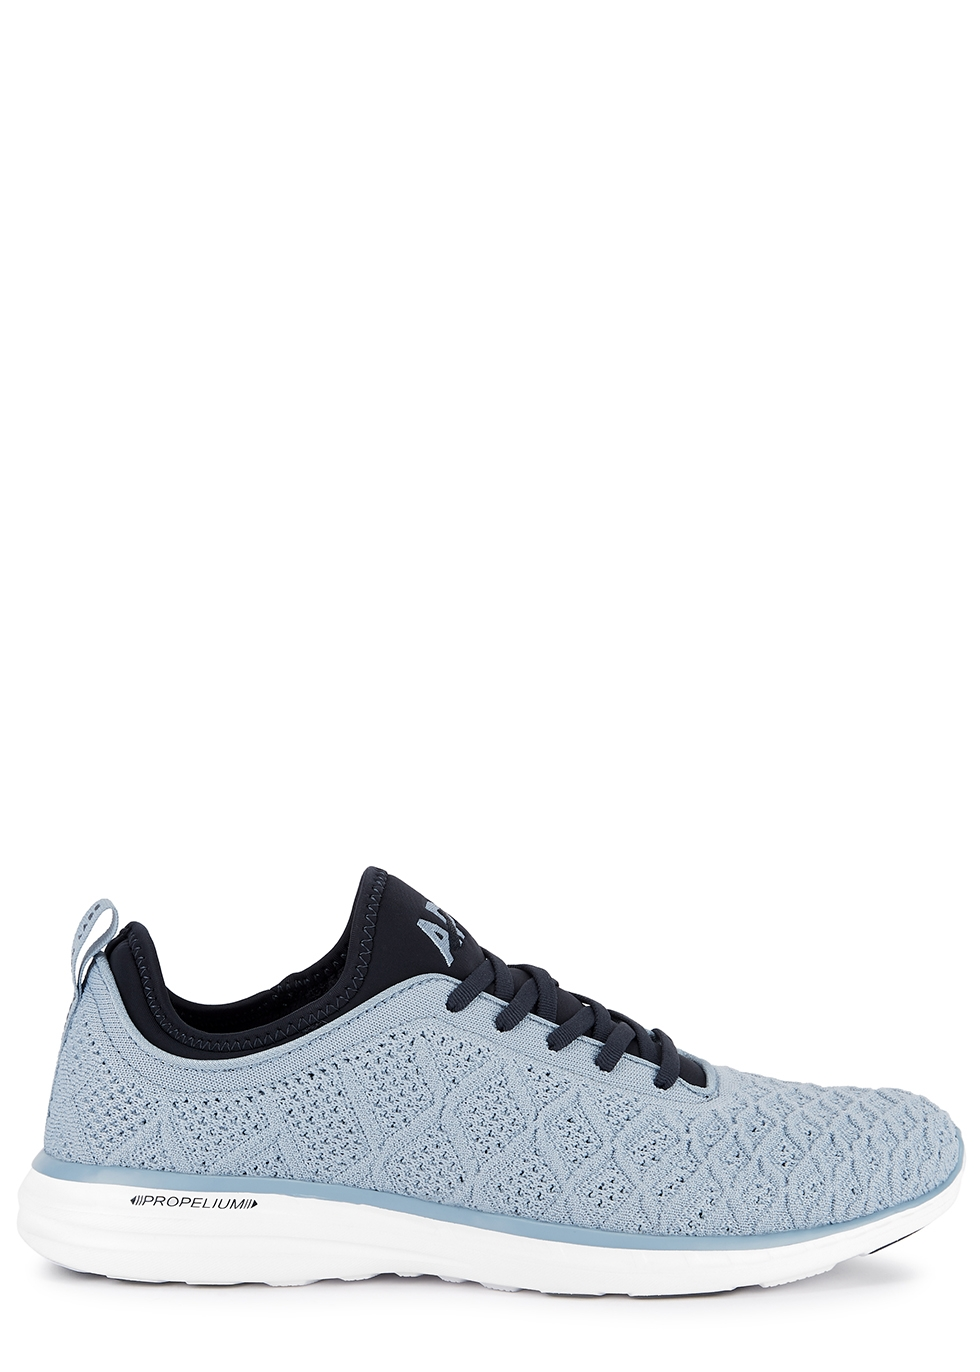 02a1cf7eb3fec3 Men's Designer Trainers, Sneakers & Sports Shoes - Harvey Nichols